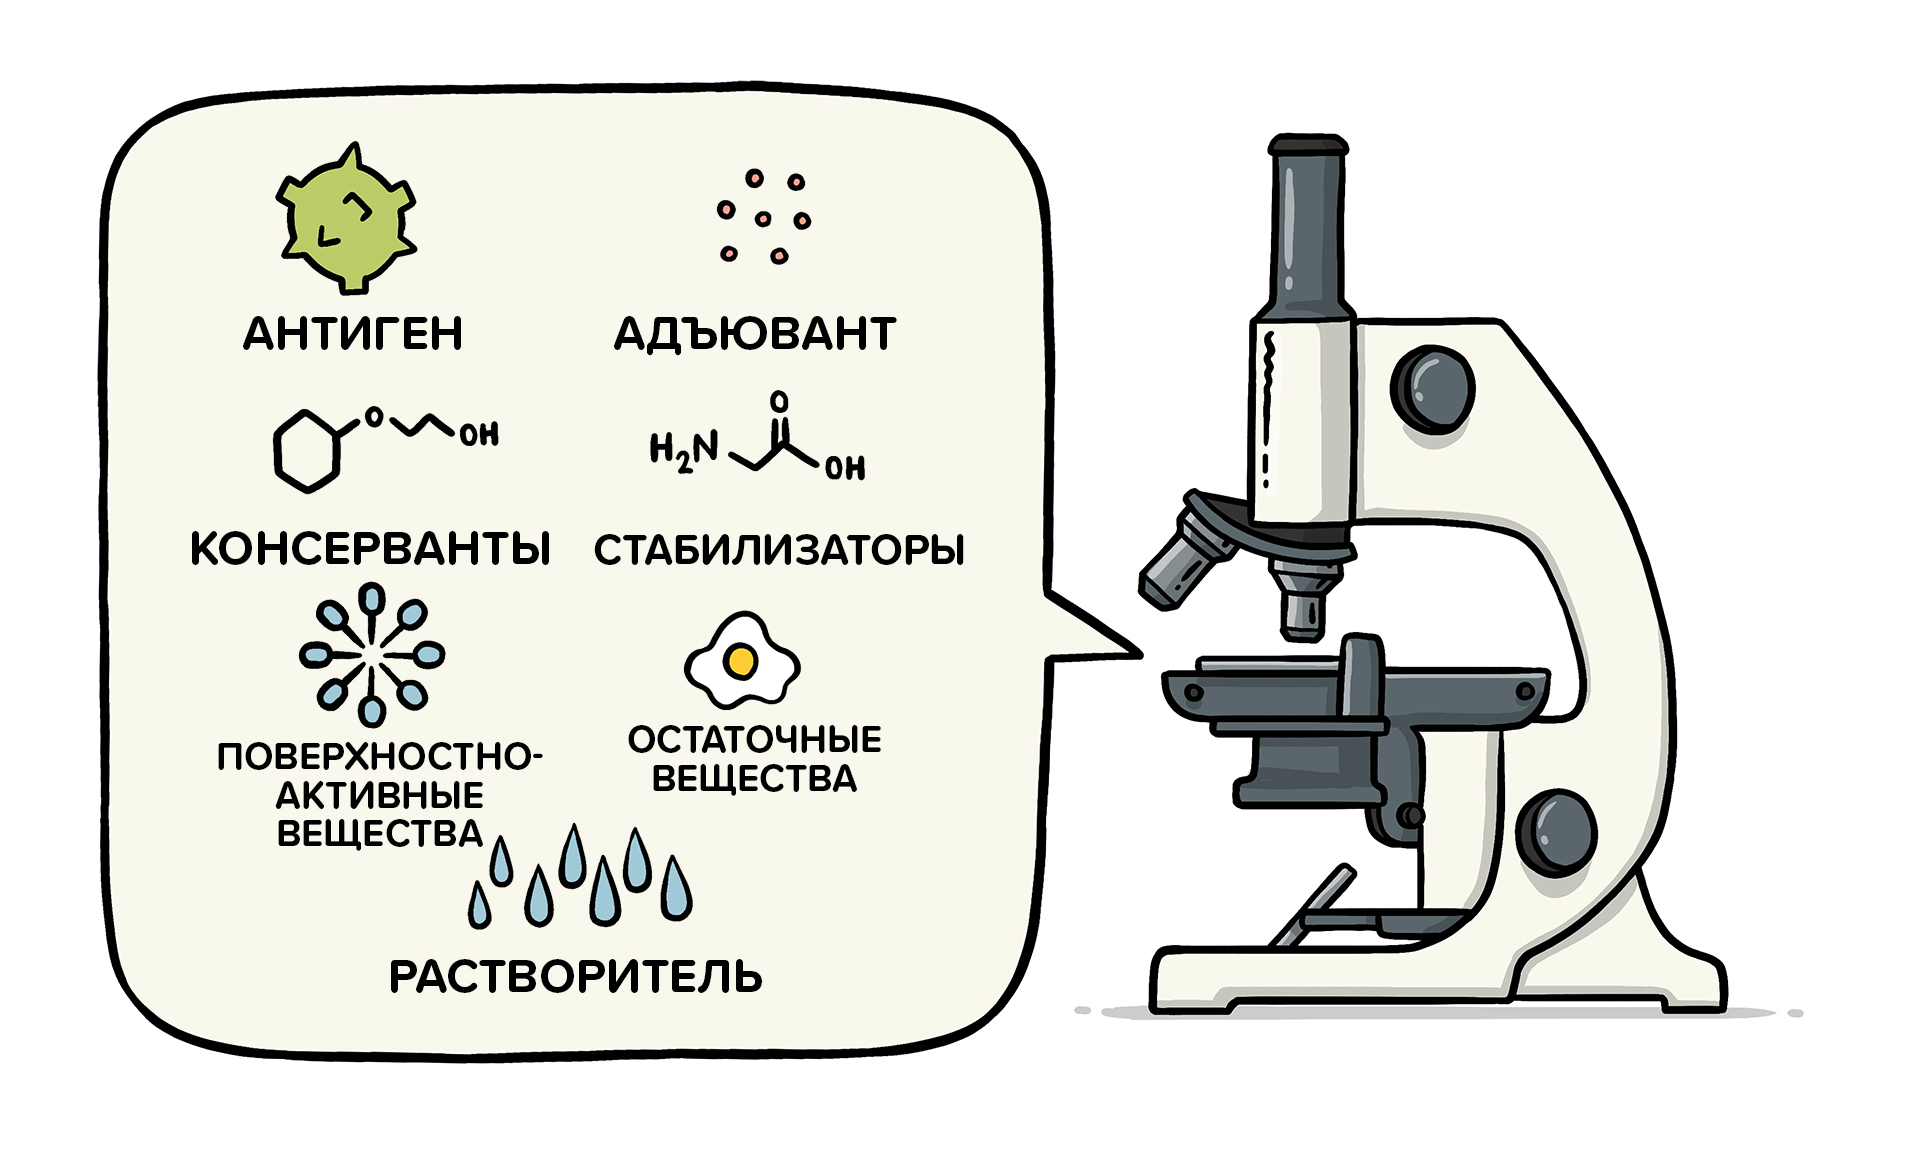 russian-vaccines-topic-2-ingredients.jpg